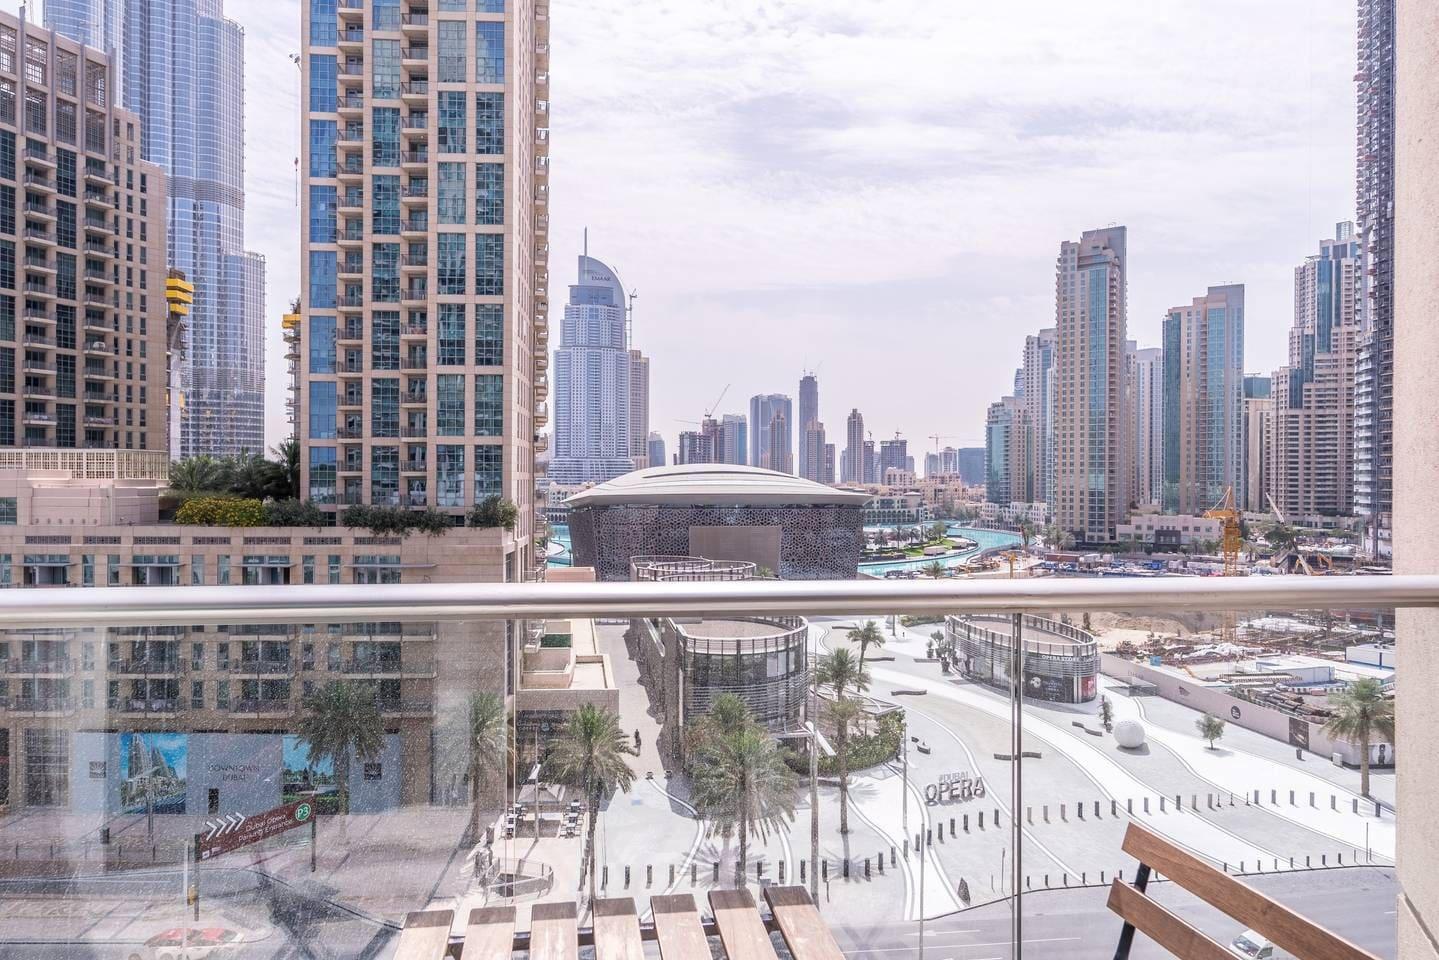 Panoramic view of the Dubai Opera and Burj Khalifa